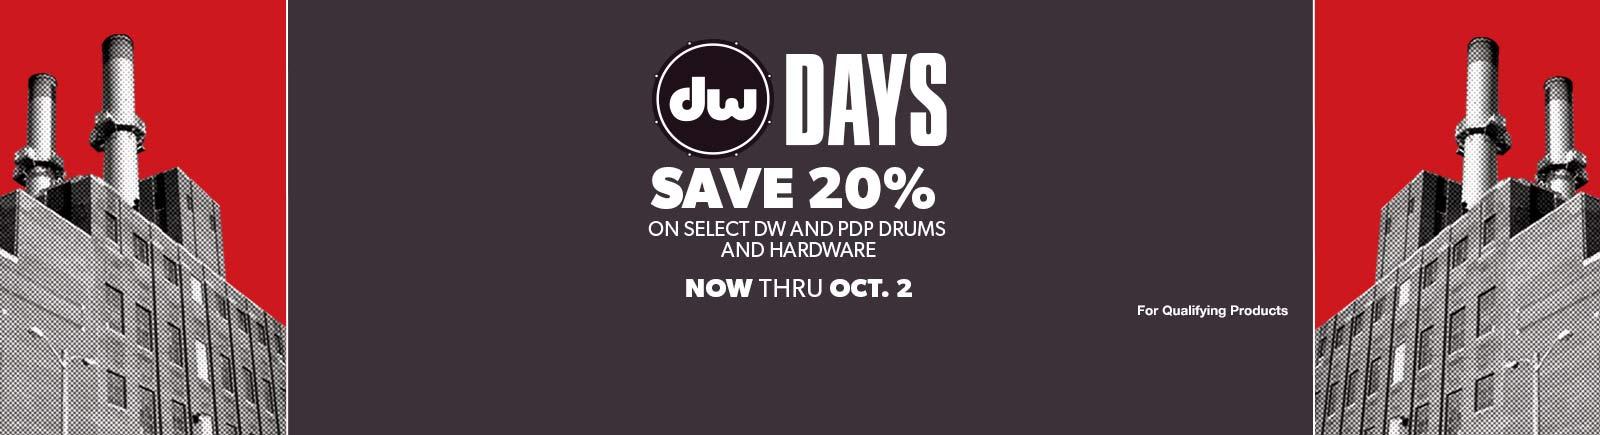 DW Days